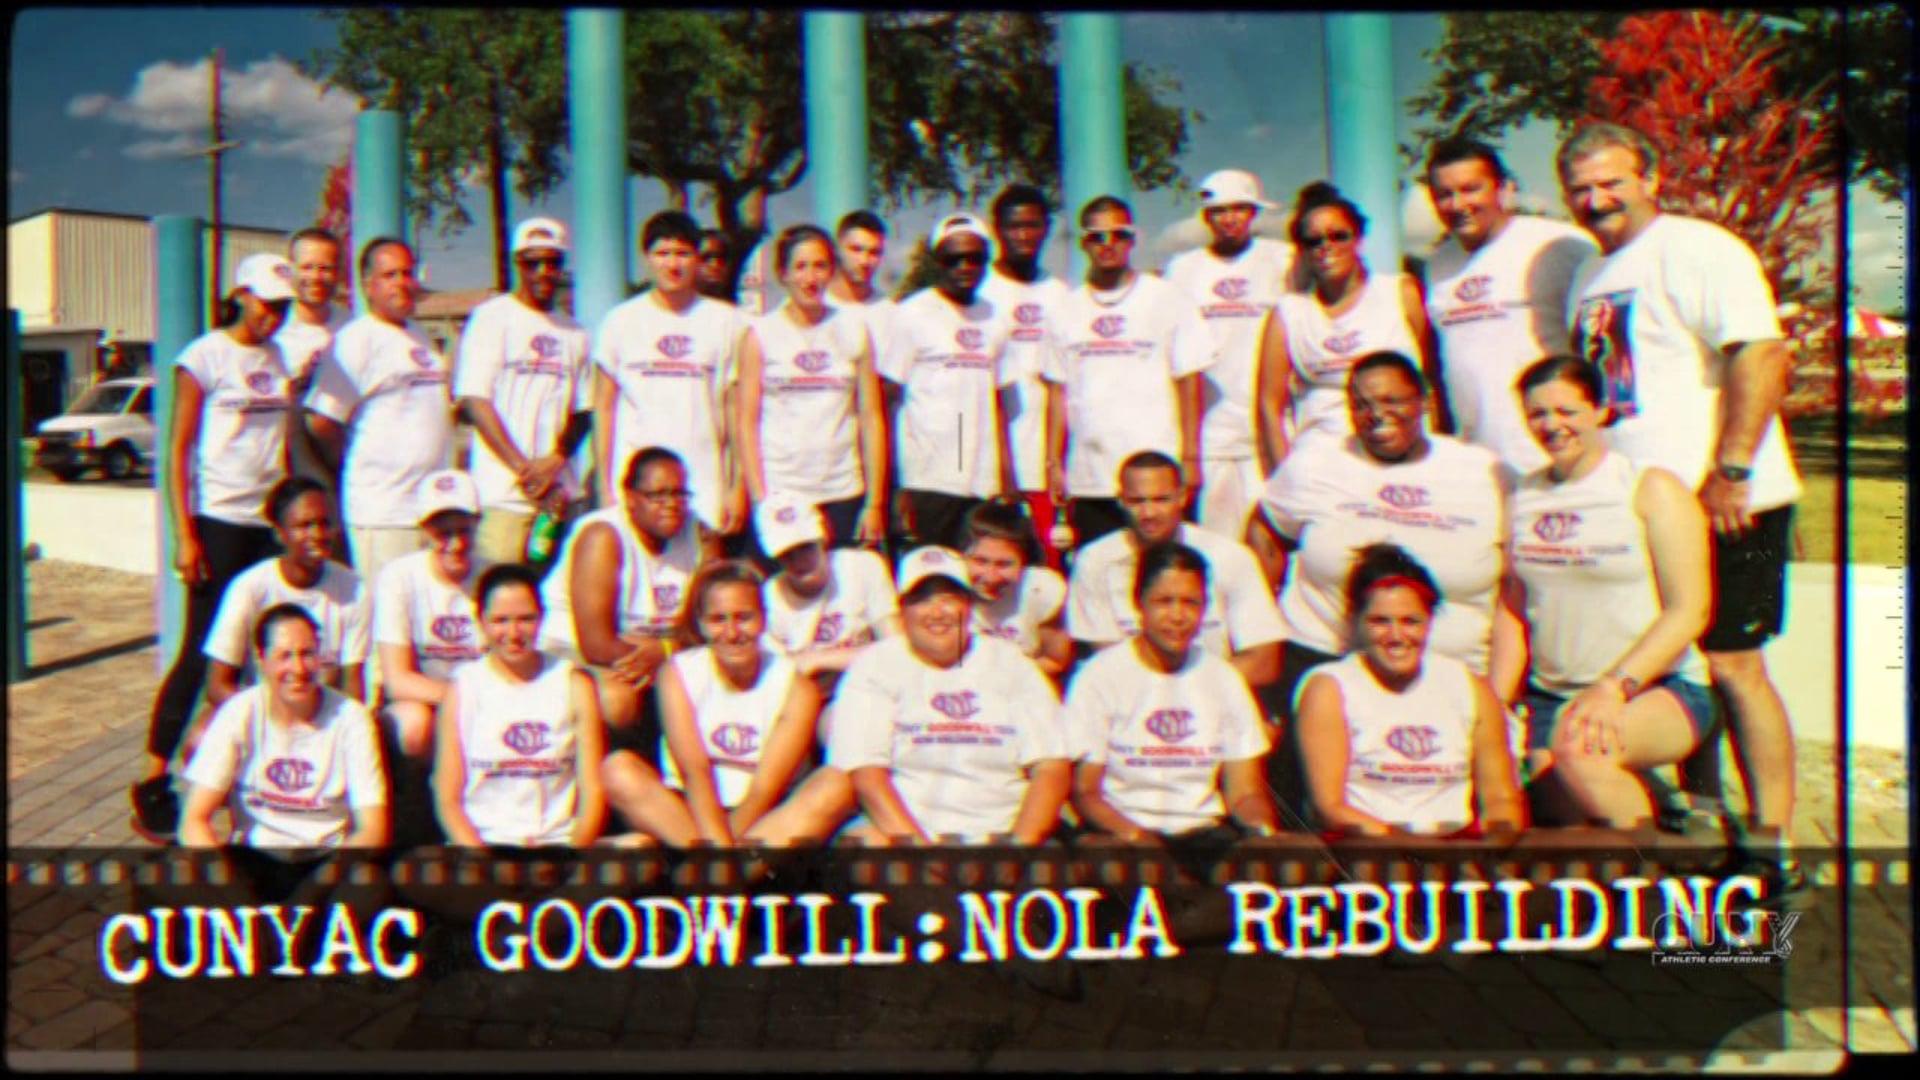 Short Documentary: CUNYAC Goodwill - Nola